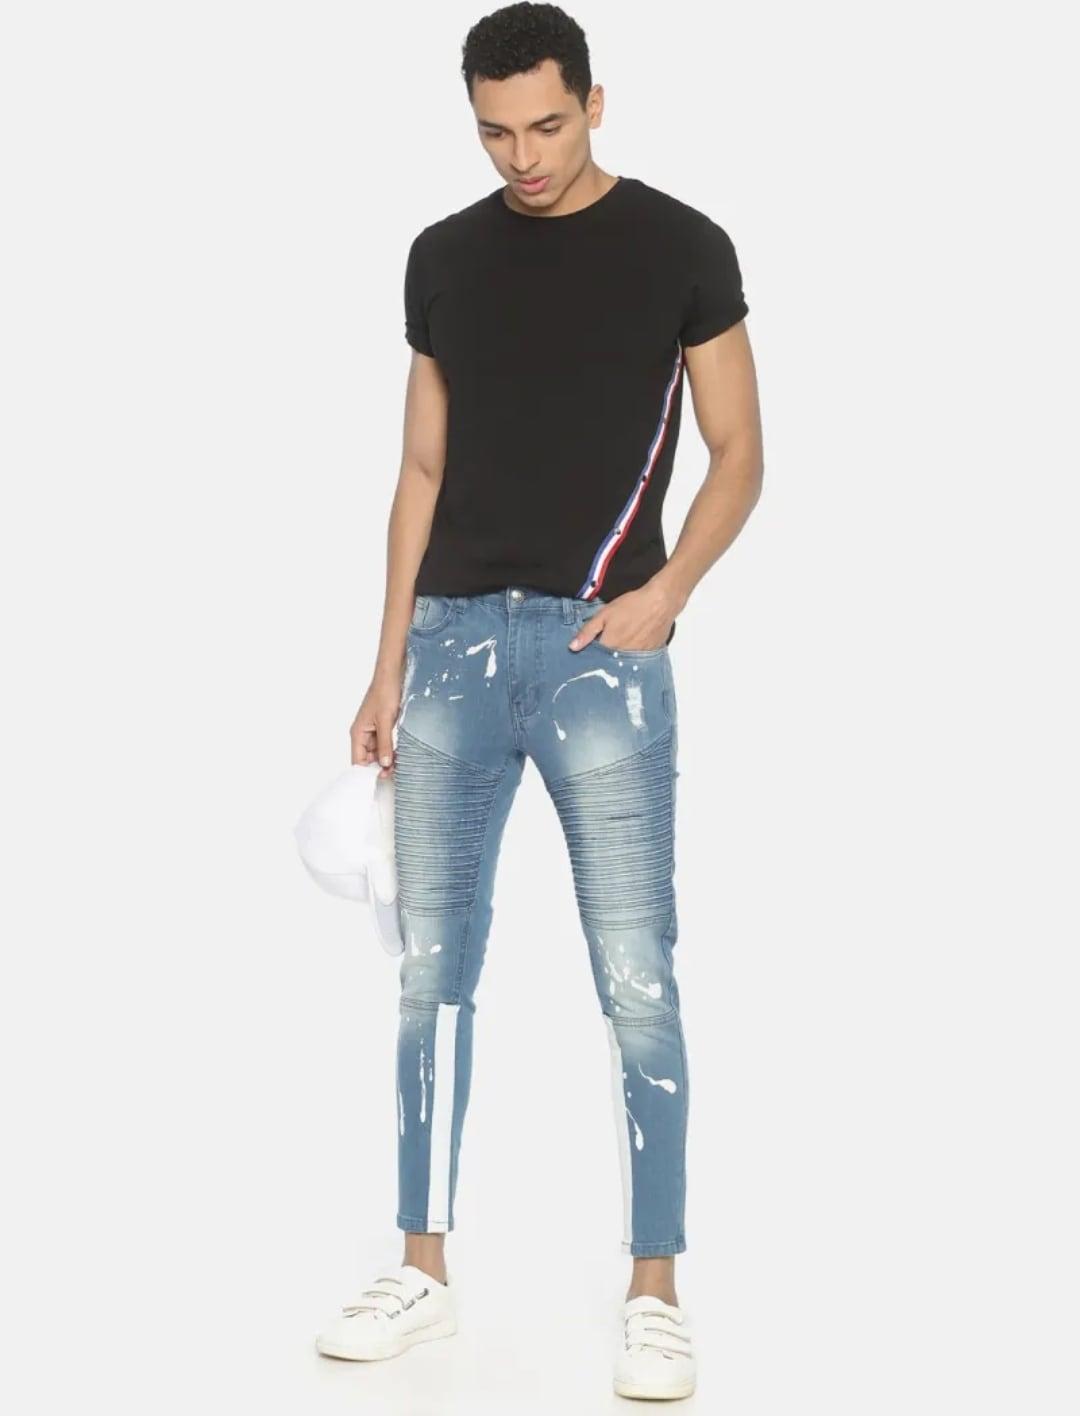 Men's Sky Blue Printed Jeans (30,Sky Blue)